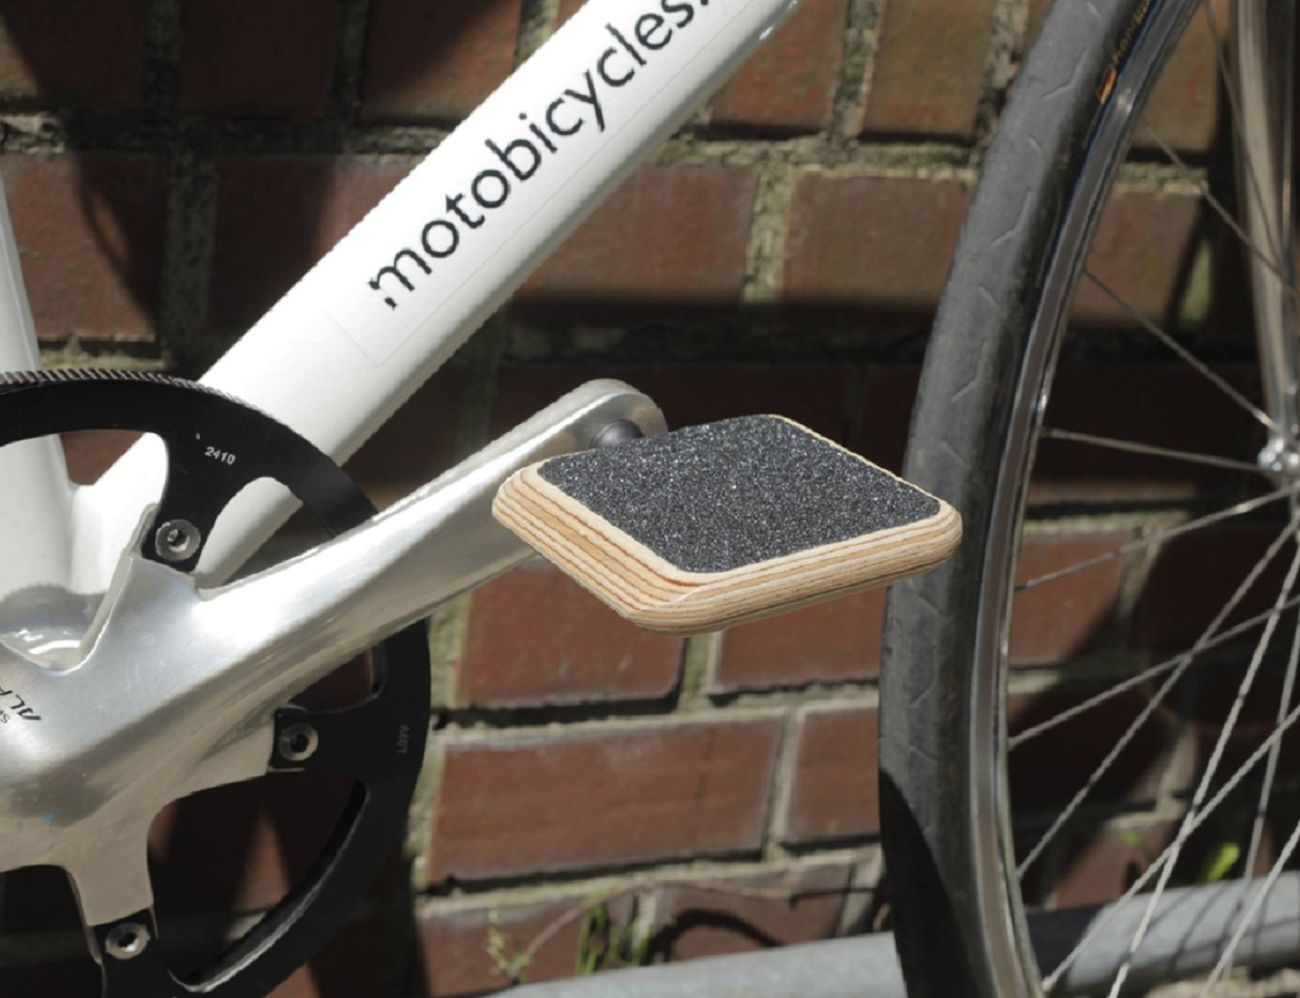 Moto Urban Wooden Bike Pedal